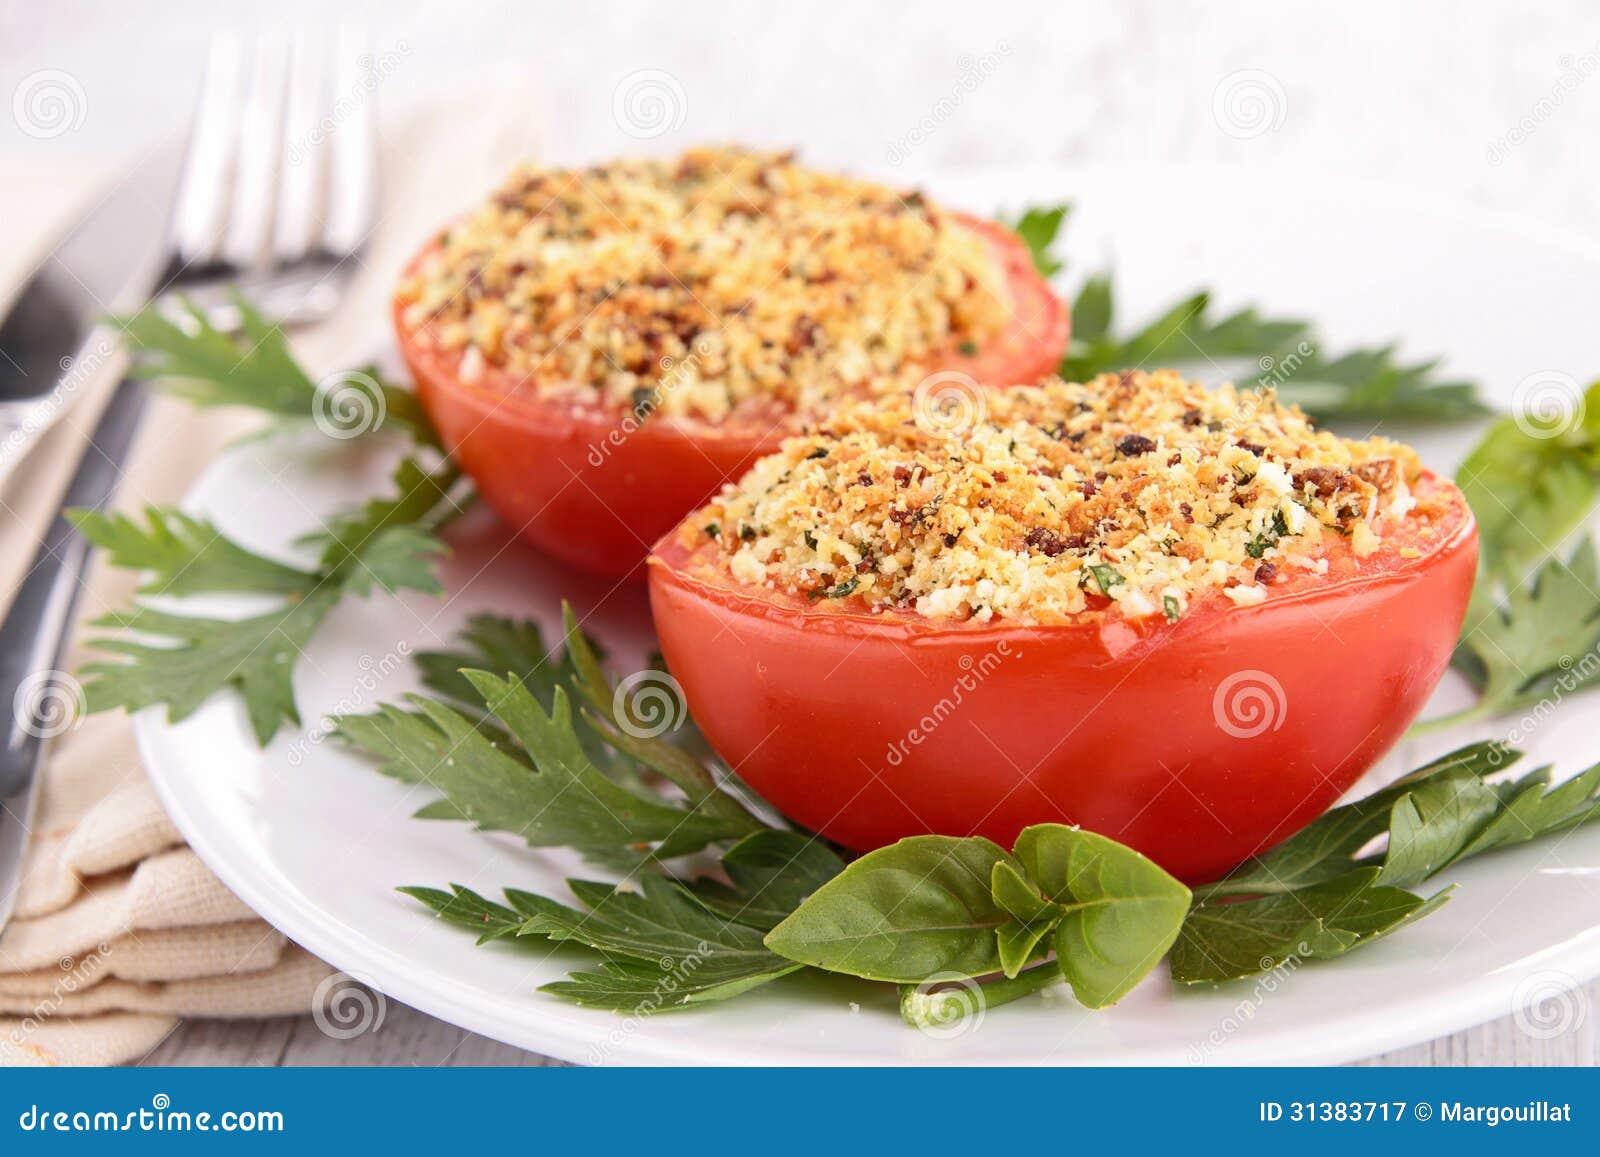 Provencal Tomato Royalty Free Stock Photography - Image: 31383717